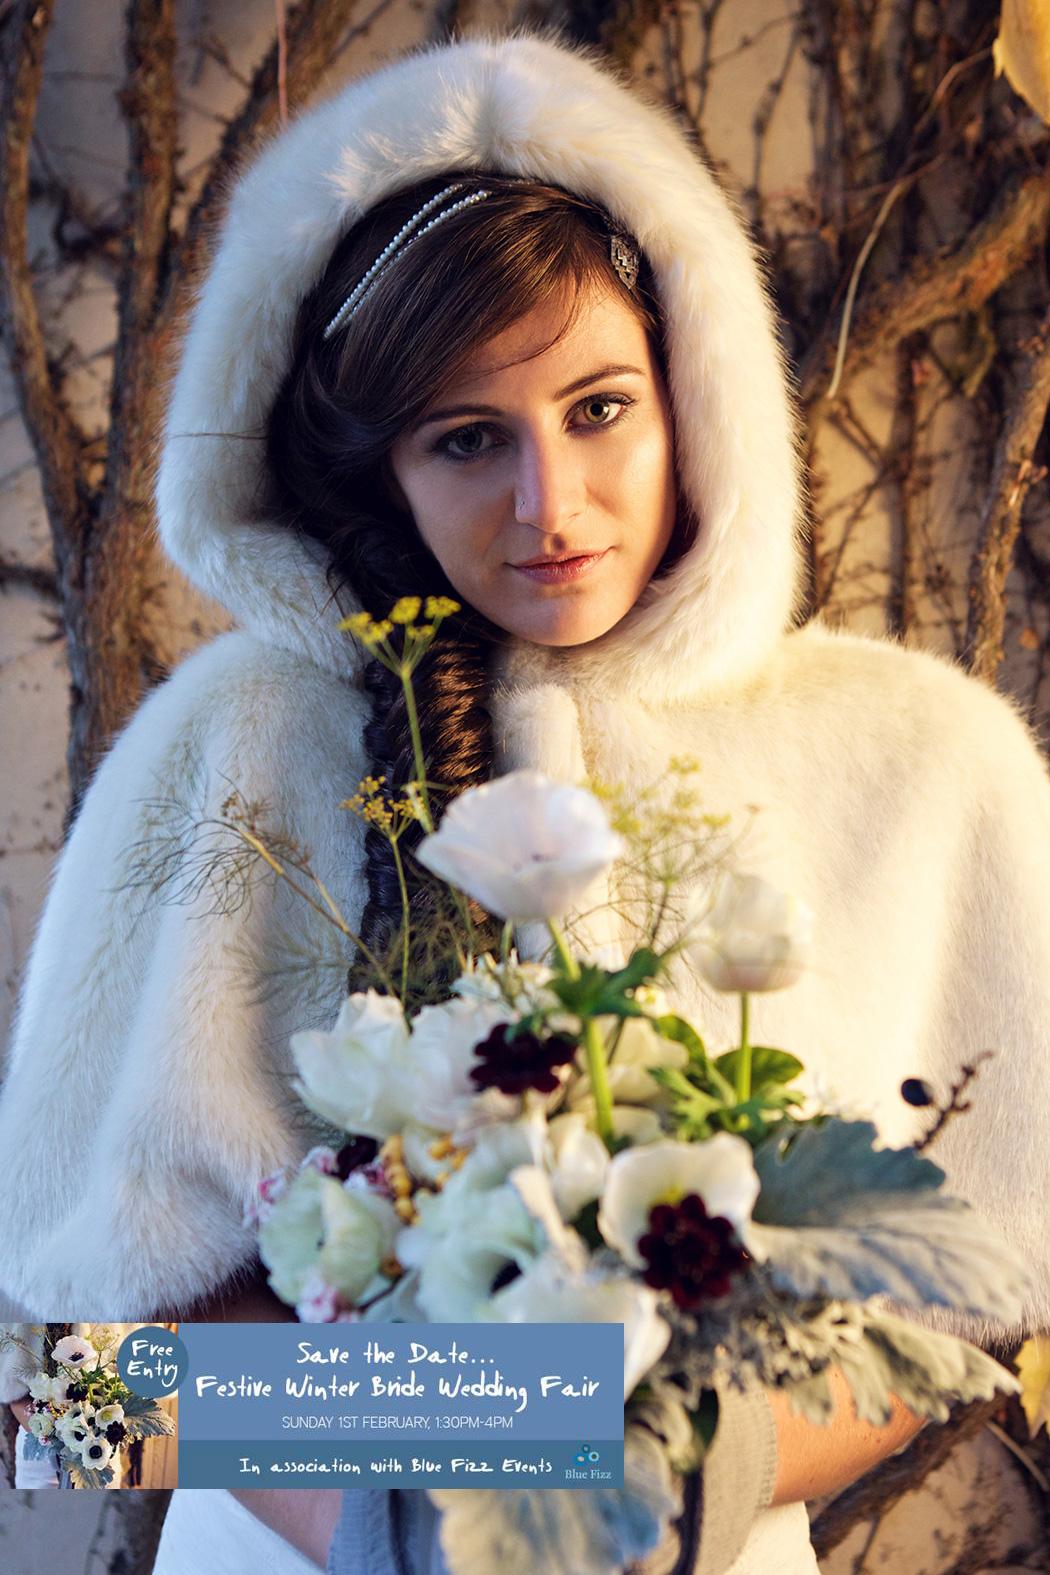 blue-fizz-events-winter-bride-wedding-fair-1